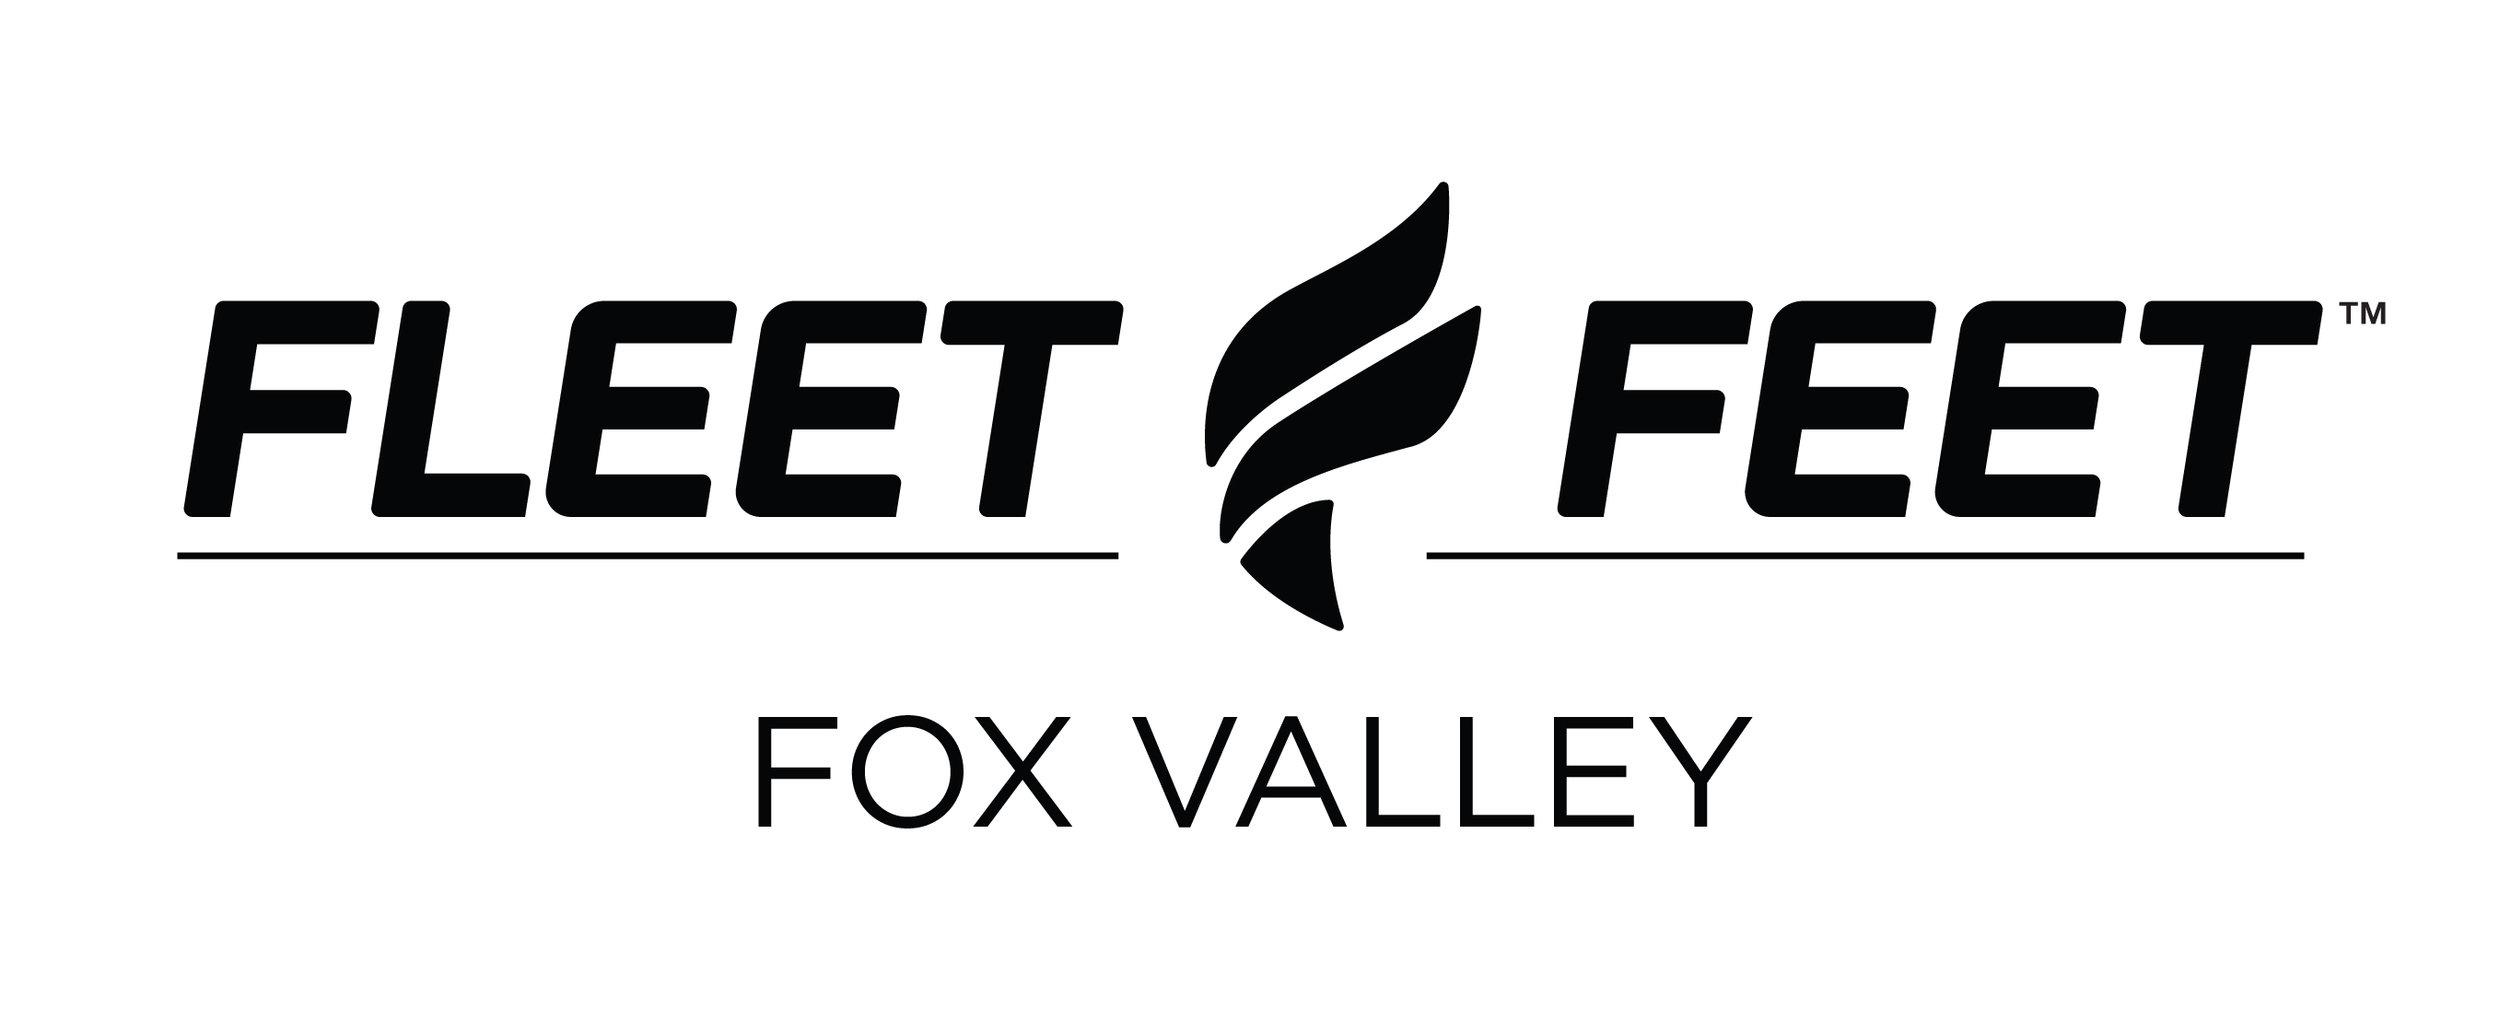 FF_Logo_FoxValley_Black.jpg